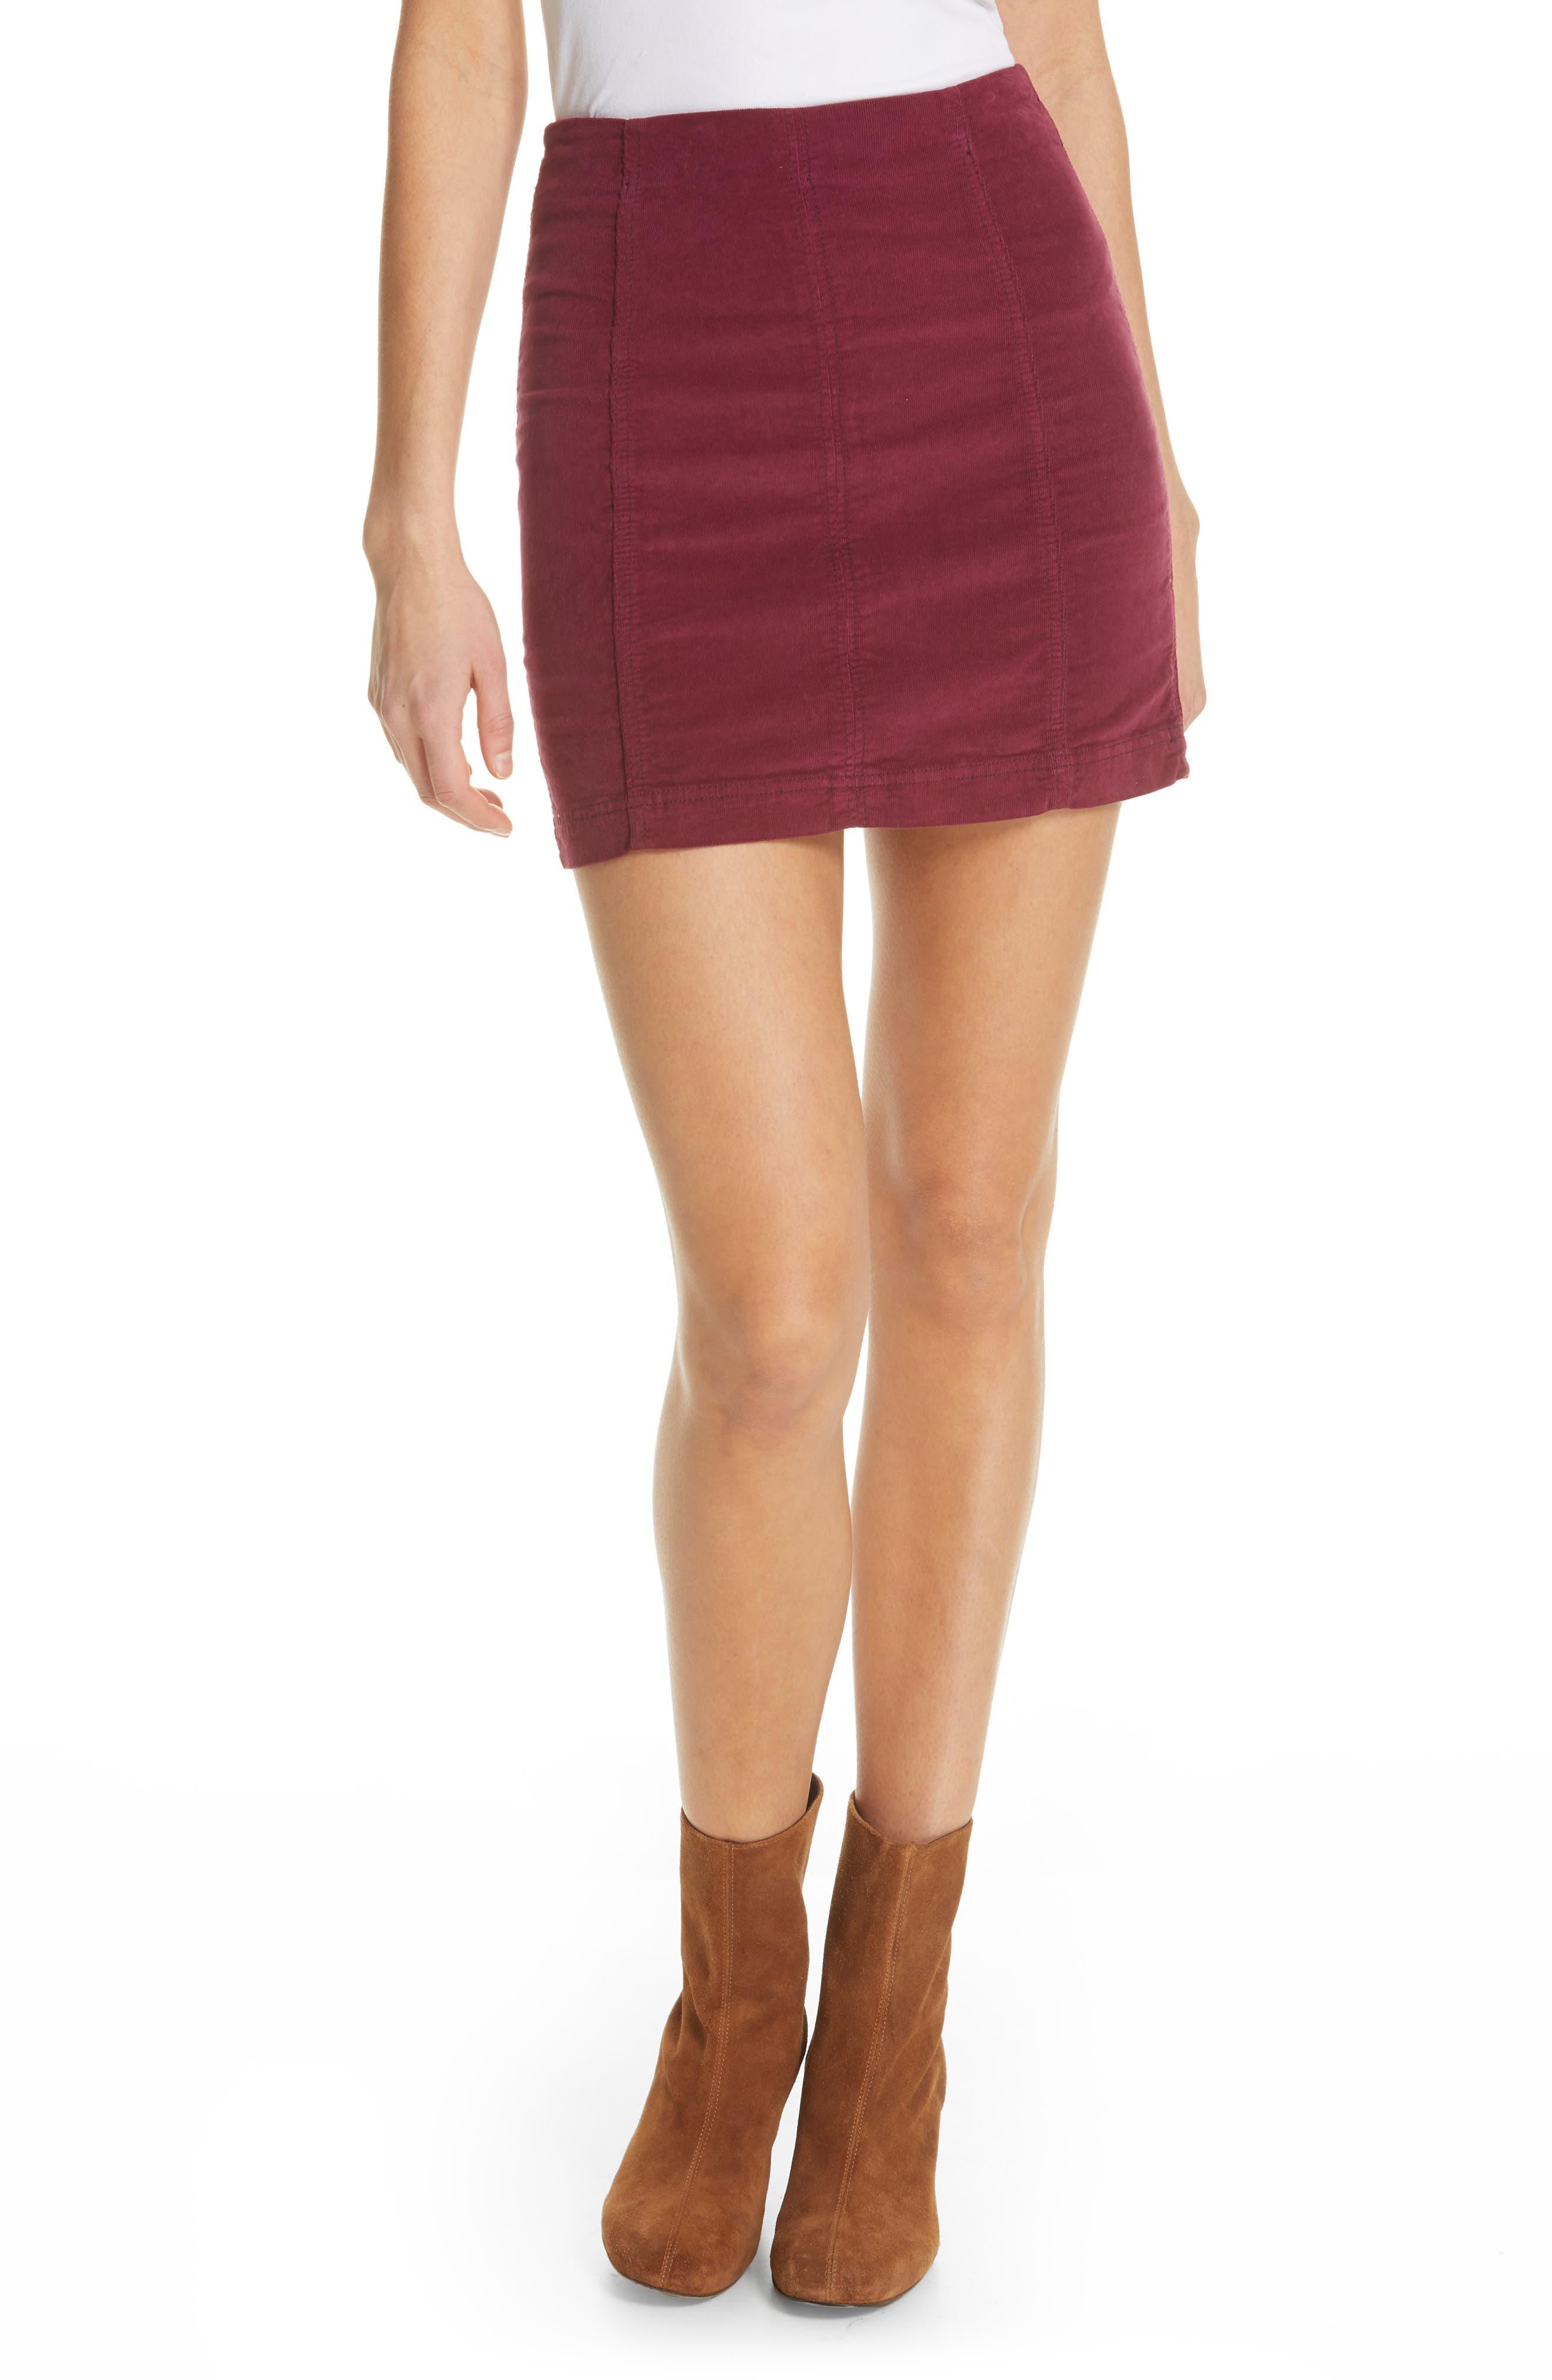 Free People Corduroy Miniskirt, Burgundy